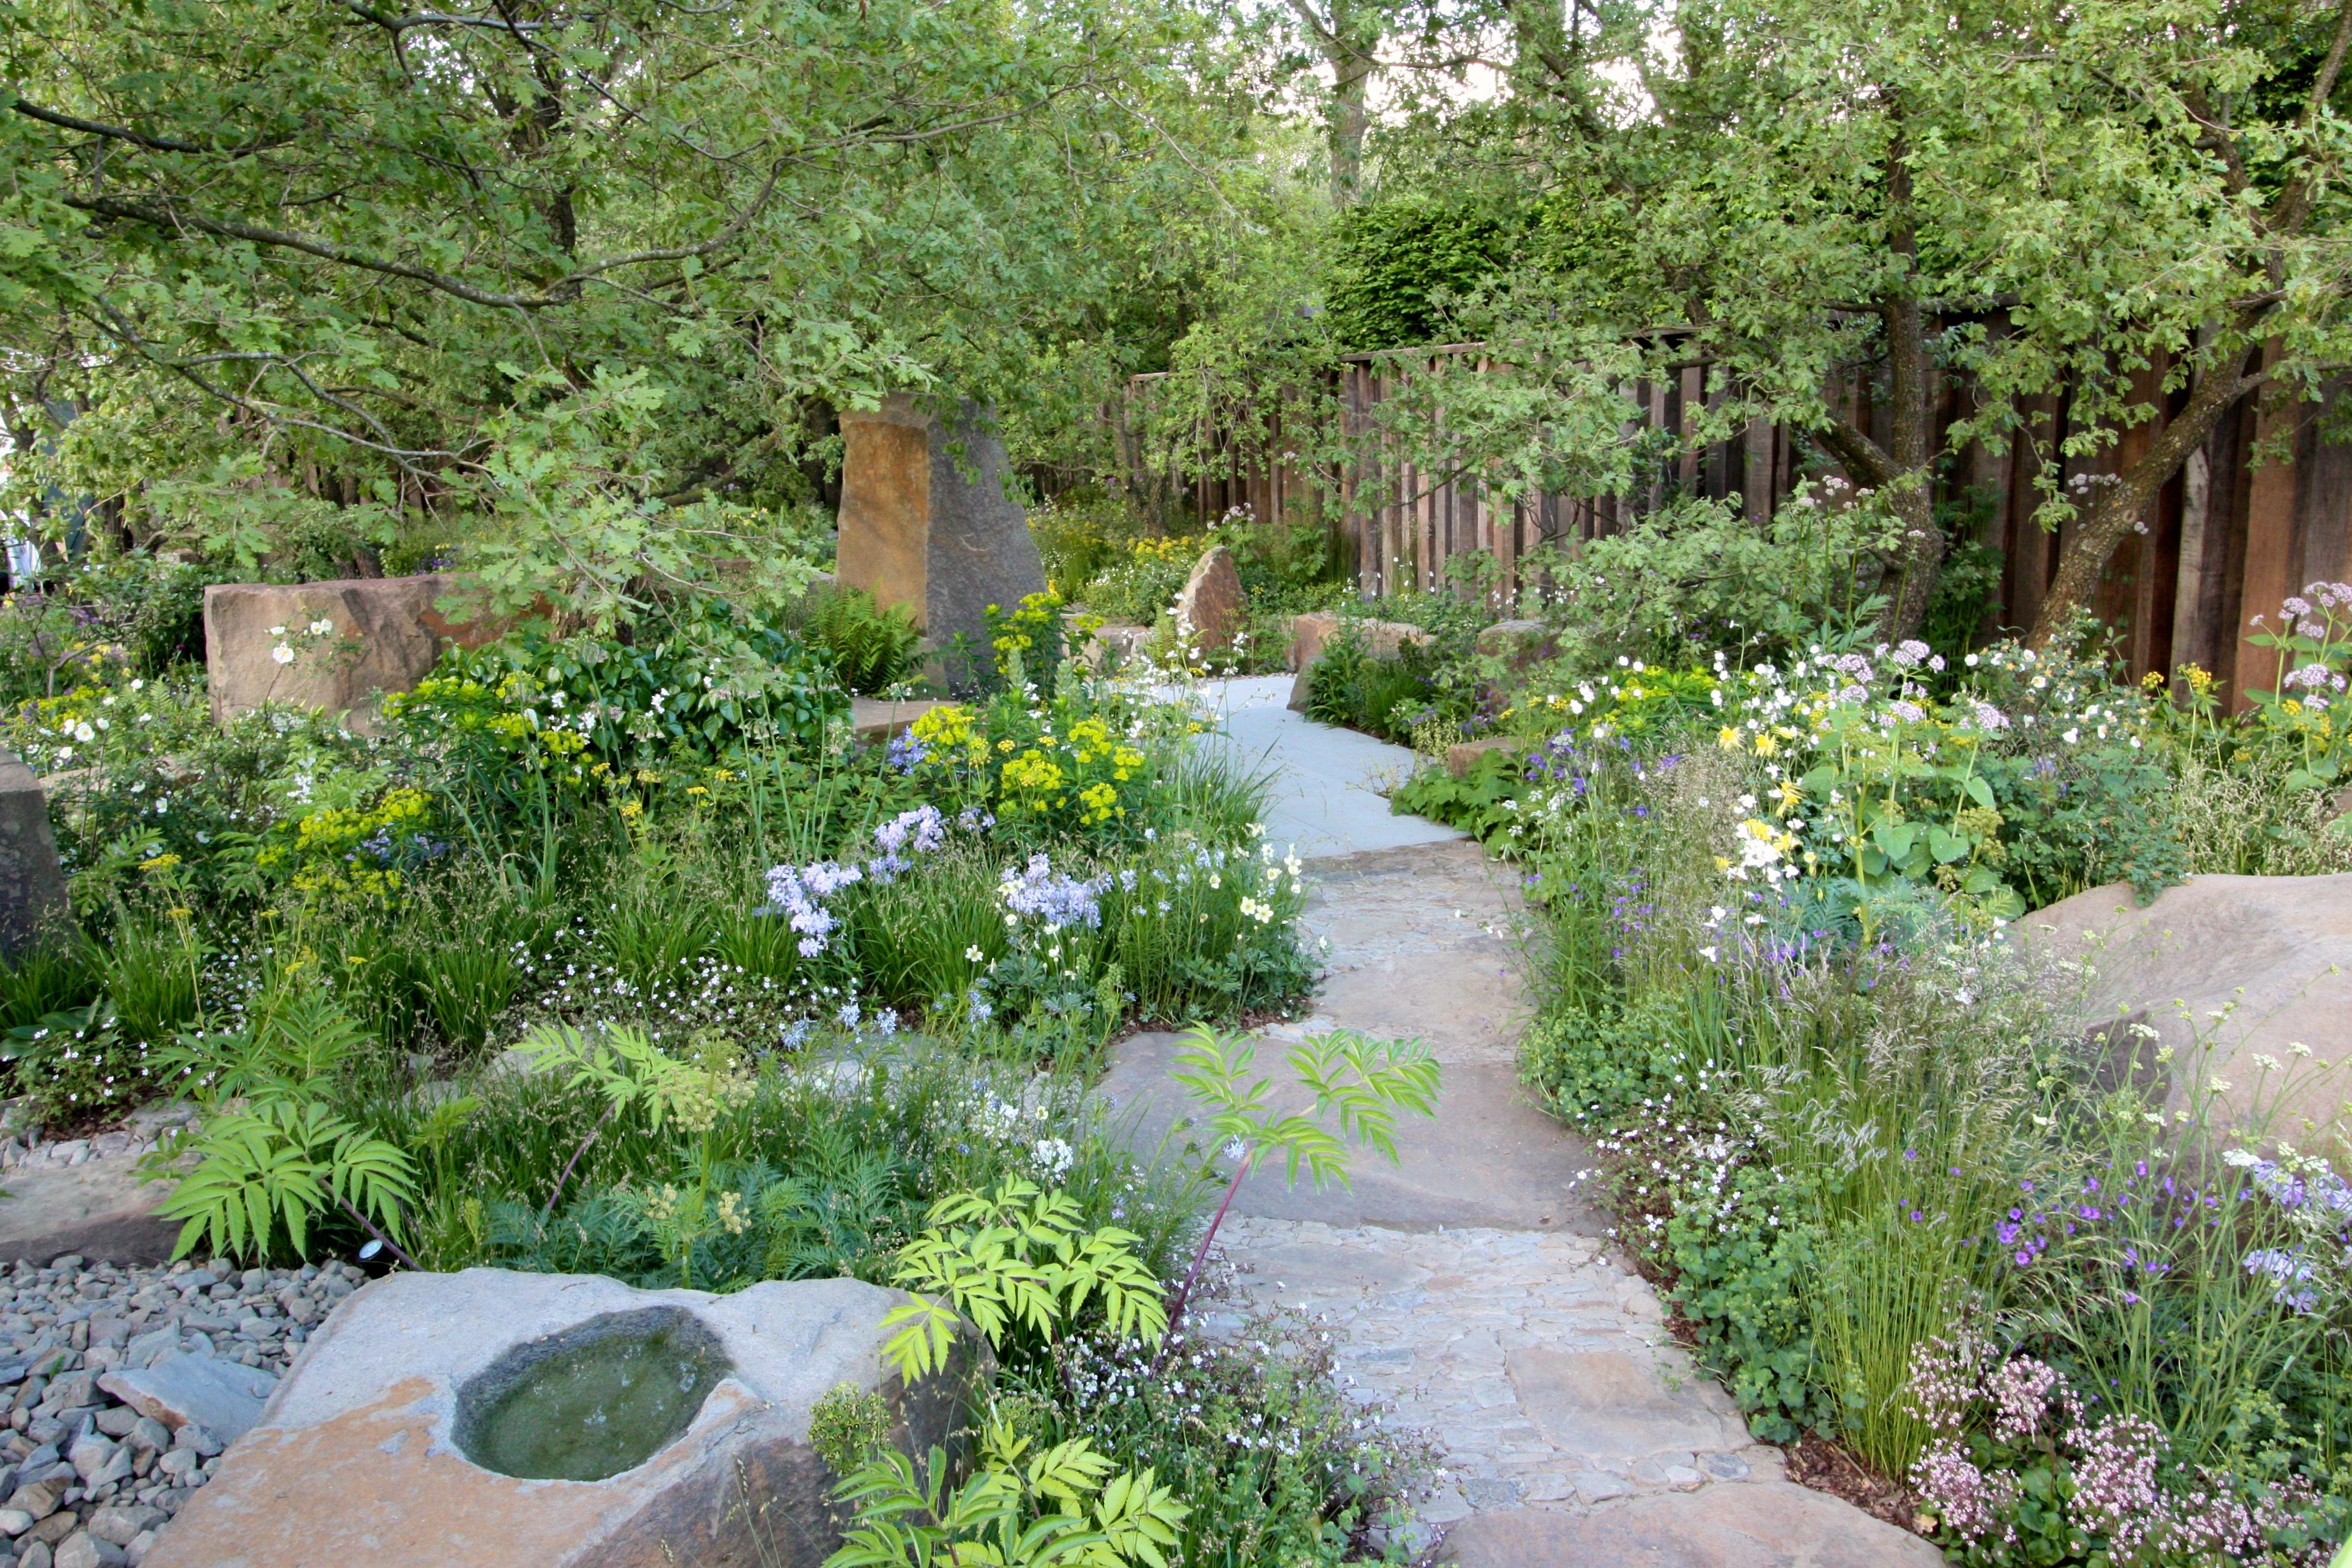 Chelsea Flower Show 2016 The Show Gardens  The Frustrated Gardener